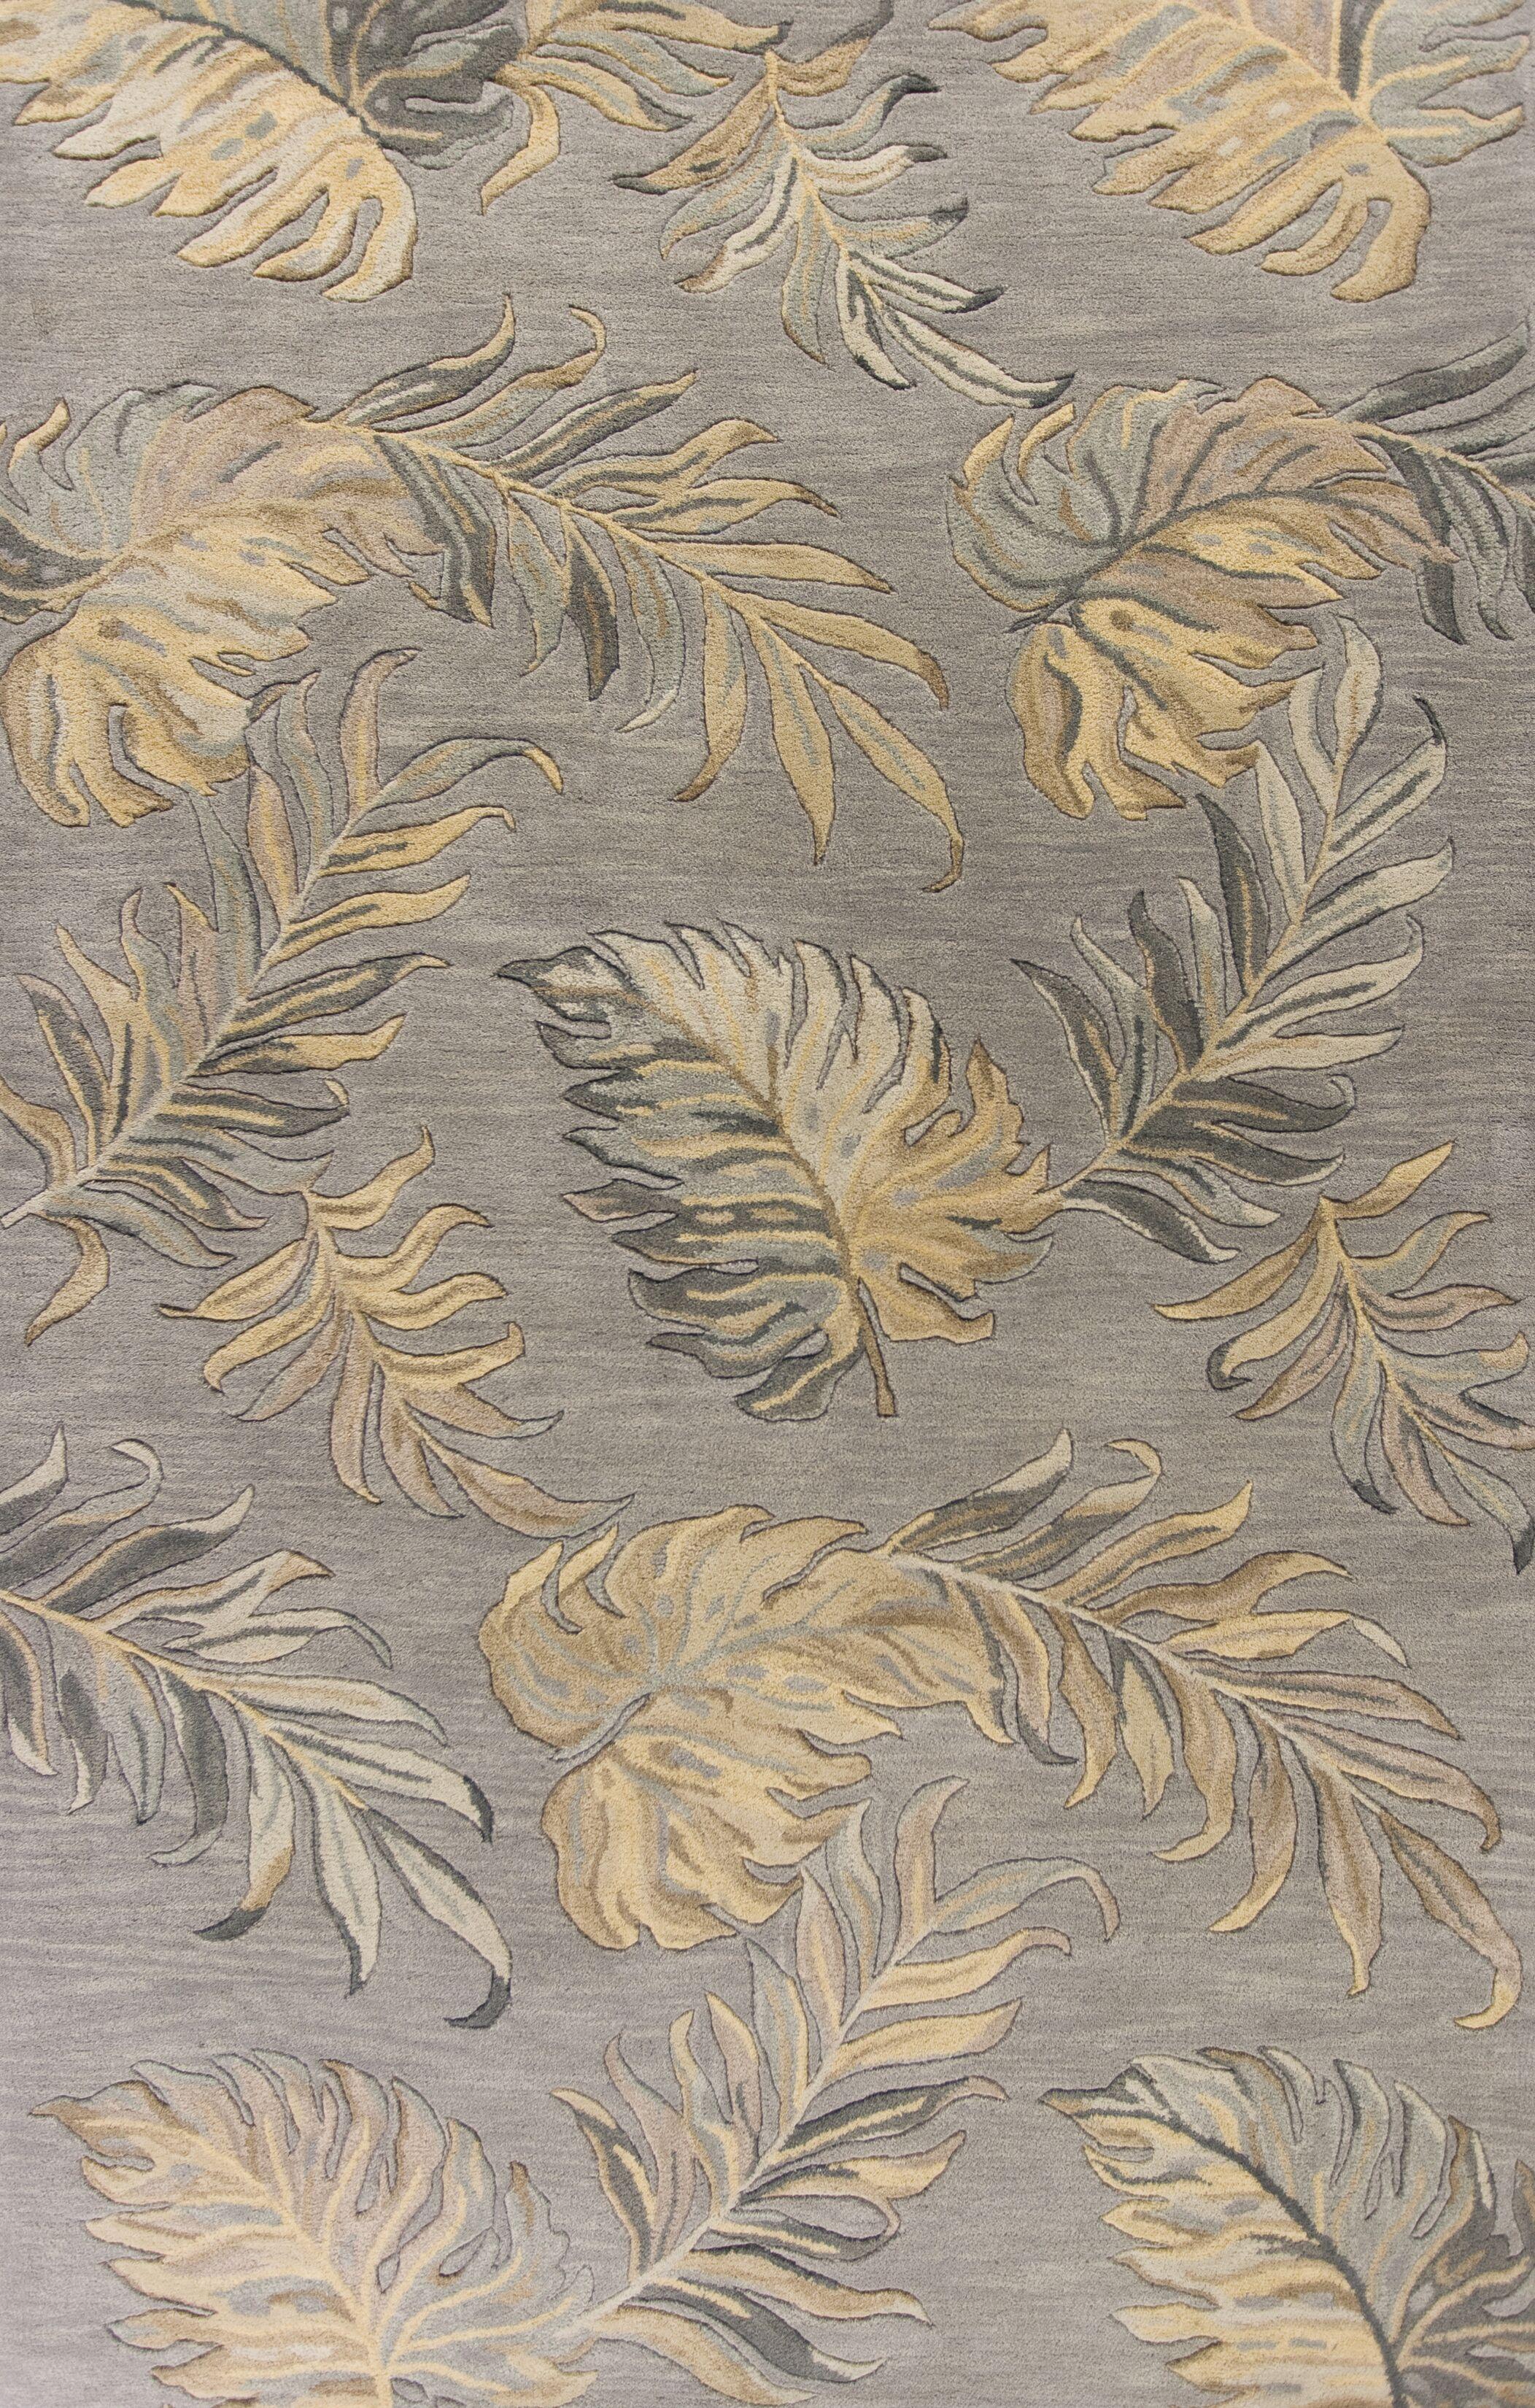 Imala Hand-Tufted Gray Area Rug Rug Size: Rectangle 5' x 8'